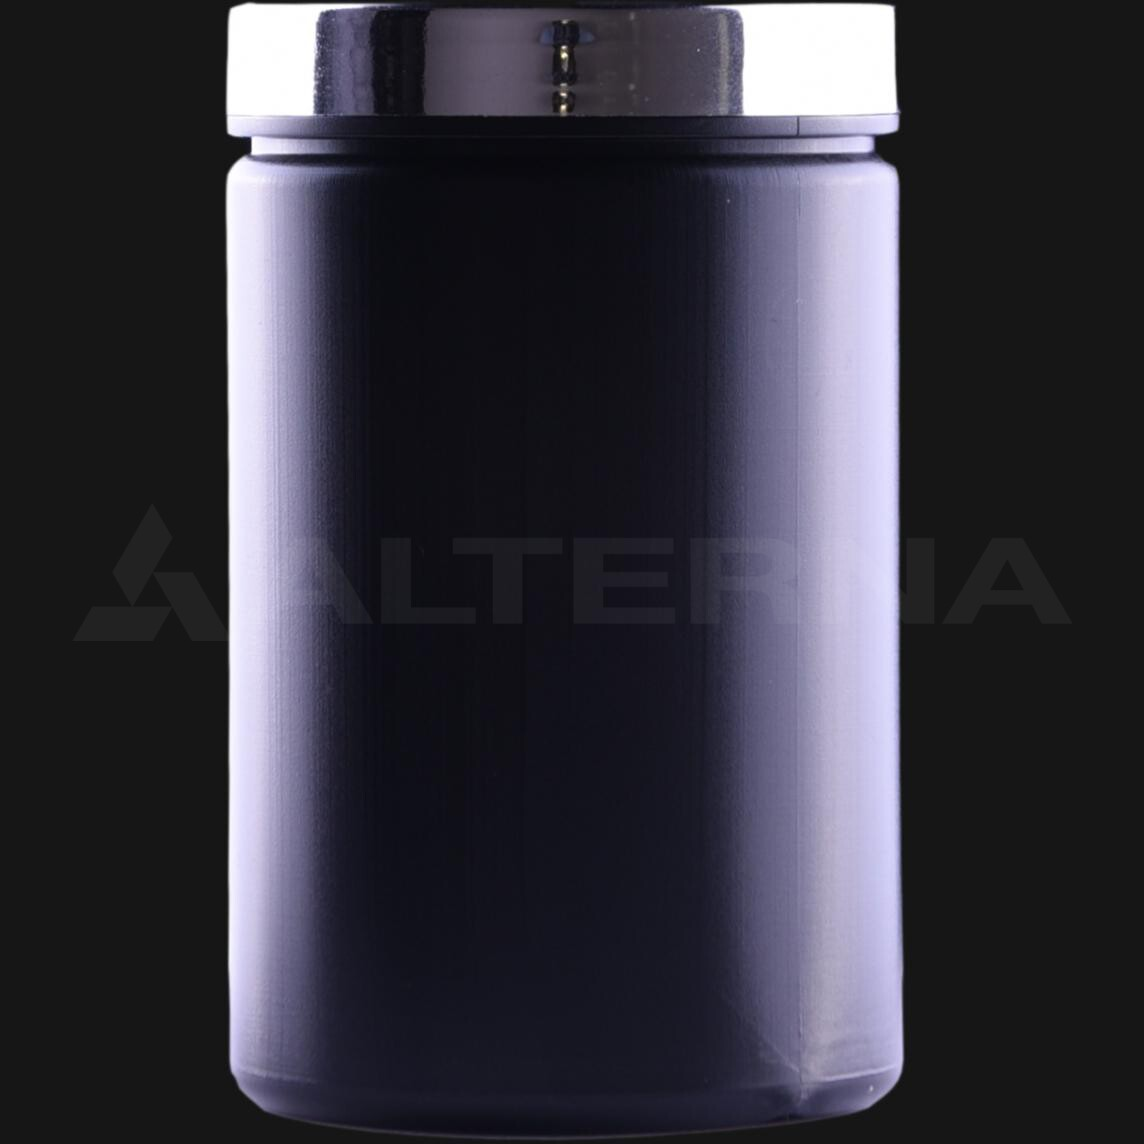 400 ml HDPE Jar with Silver Cap